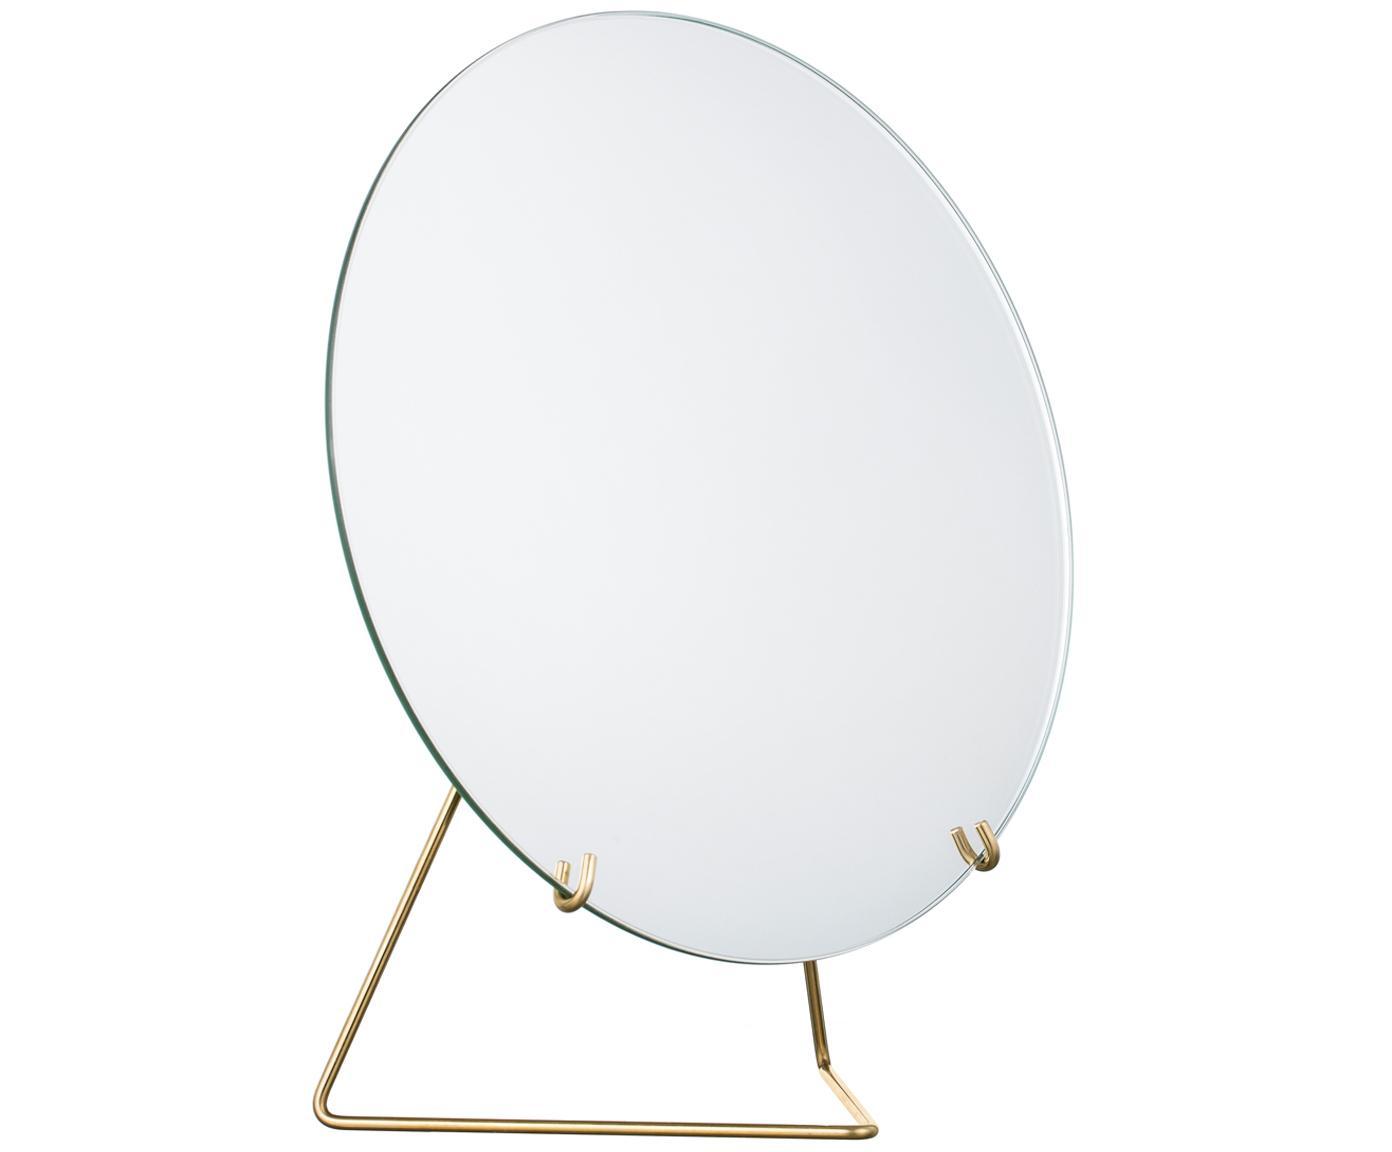 Espejo tocador Standing Mirror, Estructura: latón, Espejo: cristal, Estructura: latón Espejo: cristal, An 20 x Al 23 cm